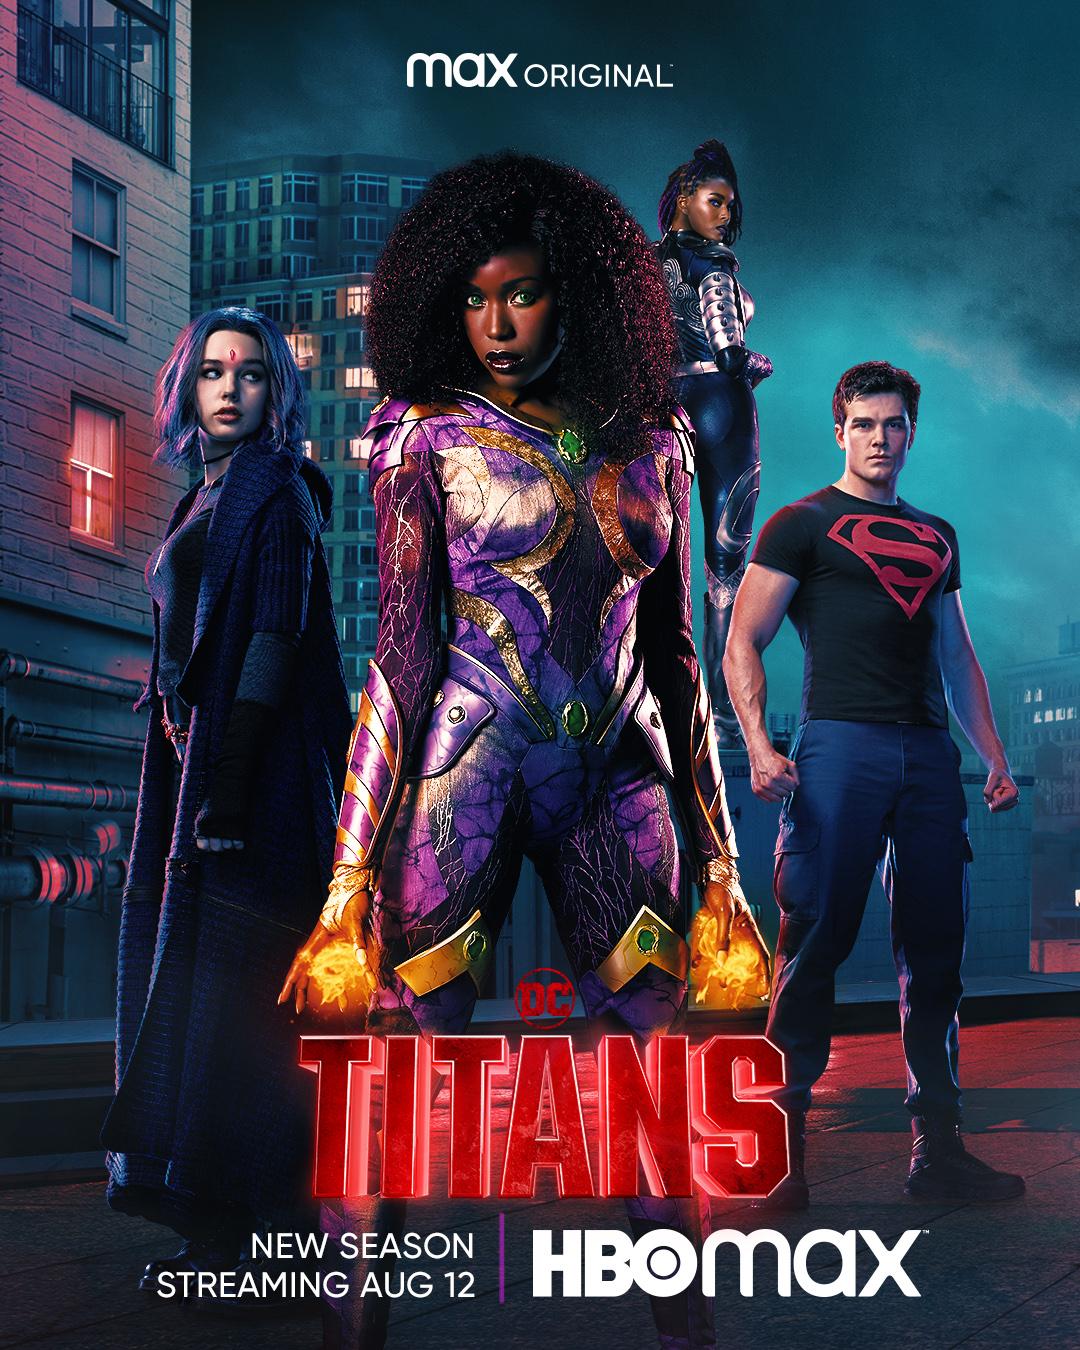 Rachel Roth/Raven (Teagan Croft), Koriand'r/Kory Anders/Starfire (Anna Diop), Komand'r/Blackfire (Damaris Lewis) y Kon-El/Conner Kent/Superboy (Joshua Orpin) en un póster promocional de la temporada 3 de Titans. Imagen: DC Titans on Max Twitter (@DCTitans).